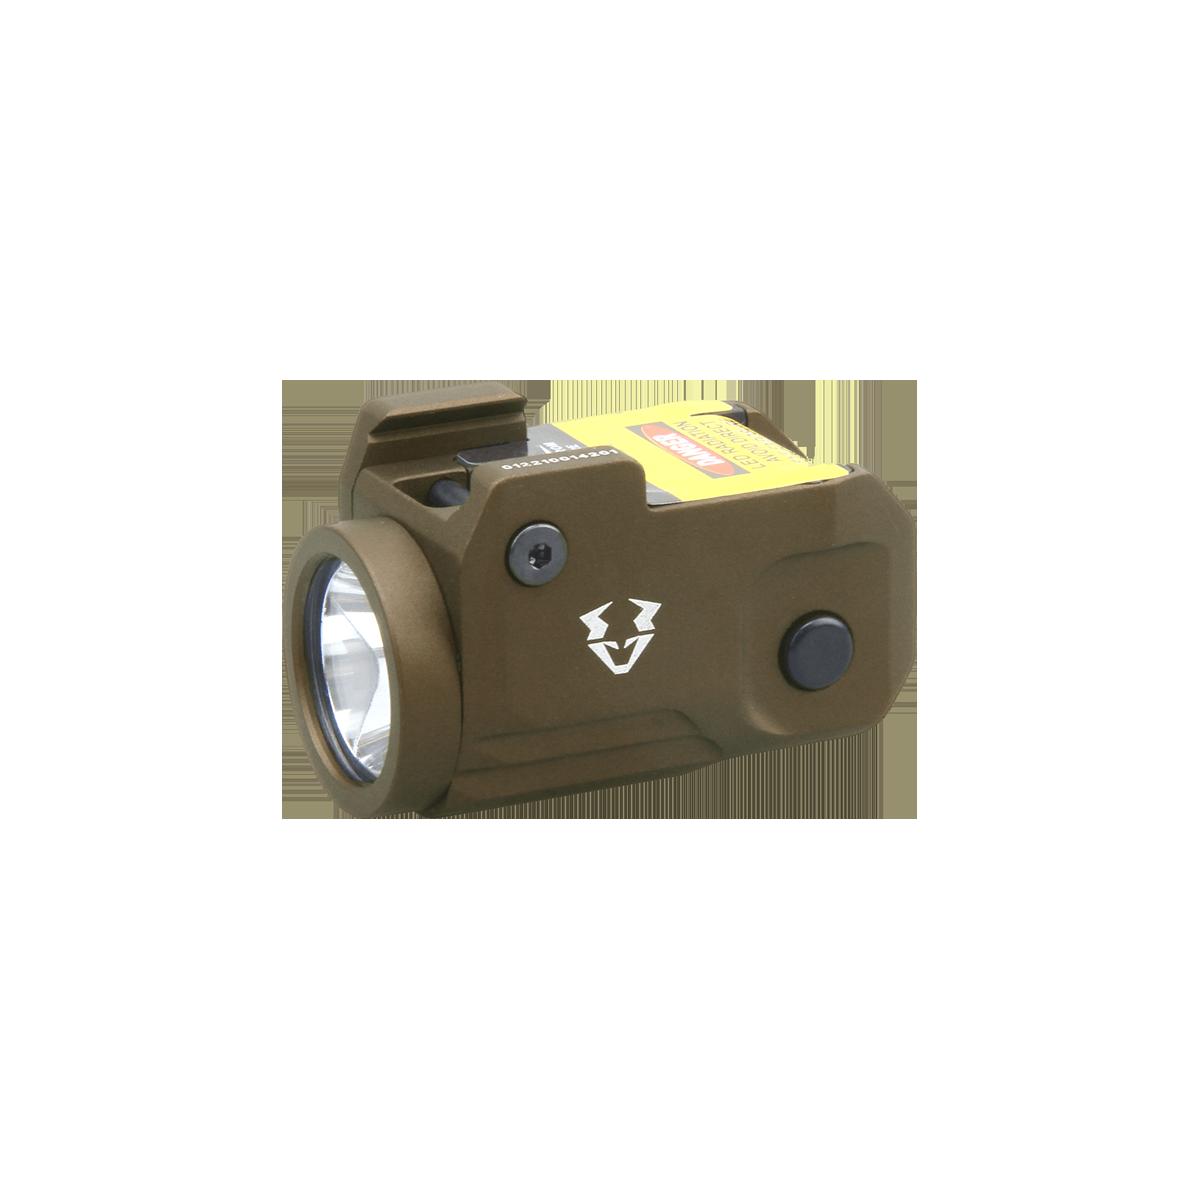 Vaide Scrapper Subcompact Pistol Flashlight FDE